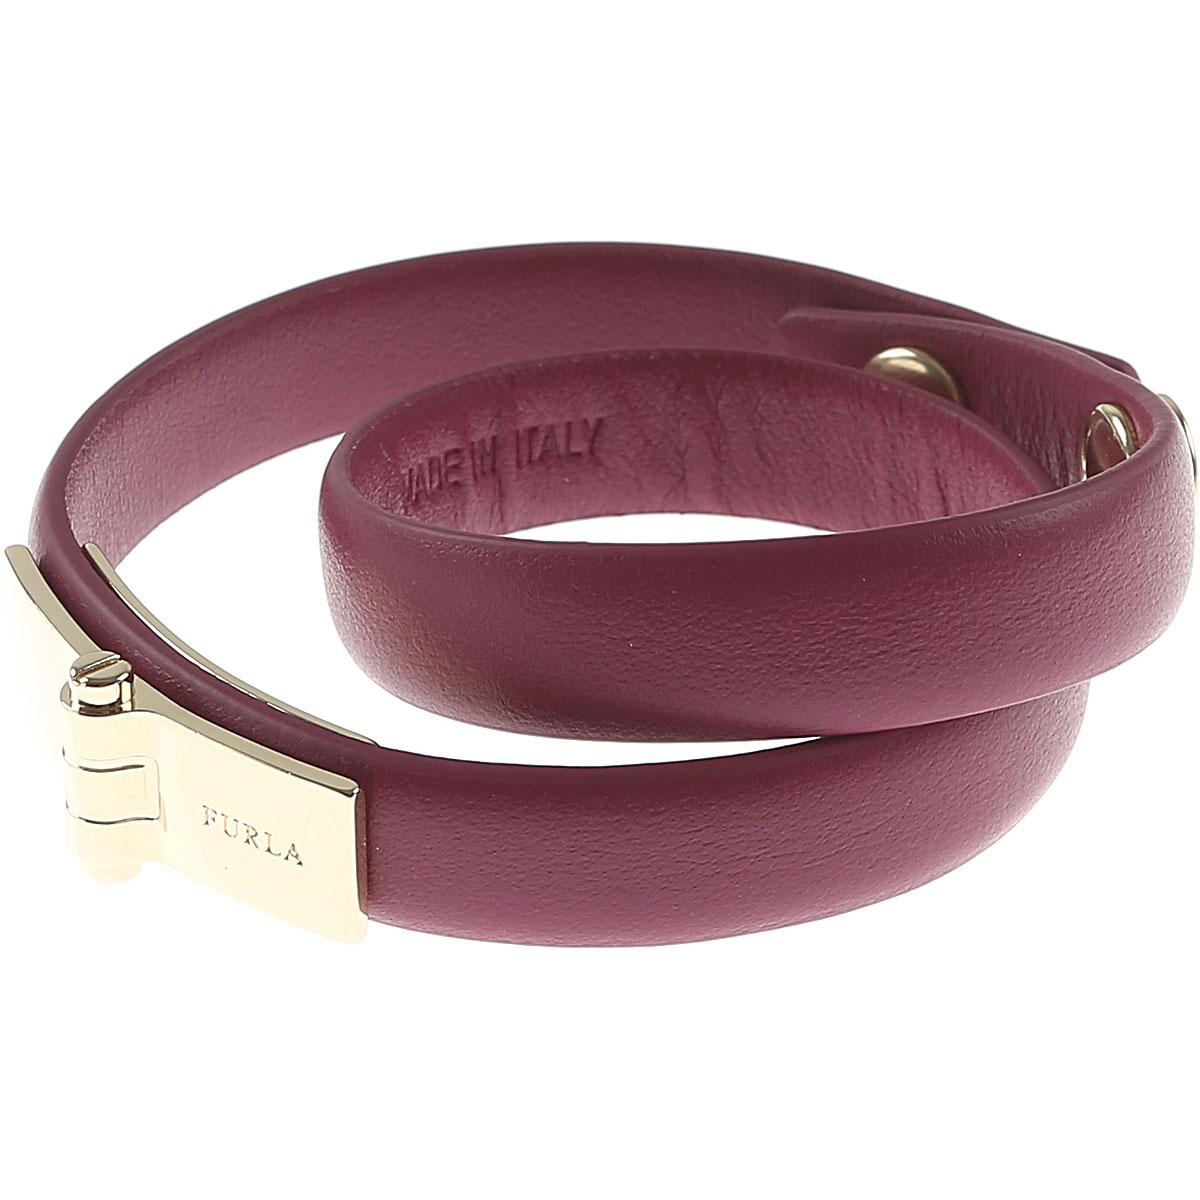 Furla Bracelet for Women On Sale in Outlet, Plum, Leather, 2019